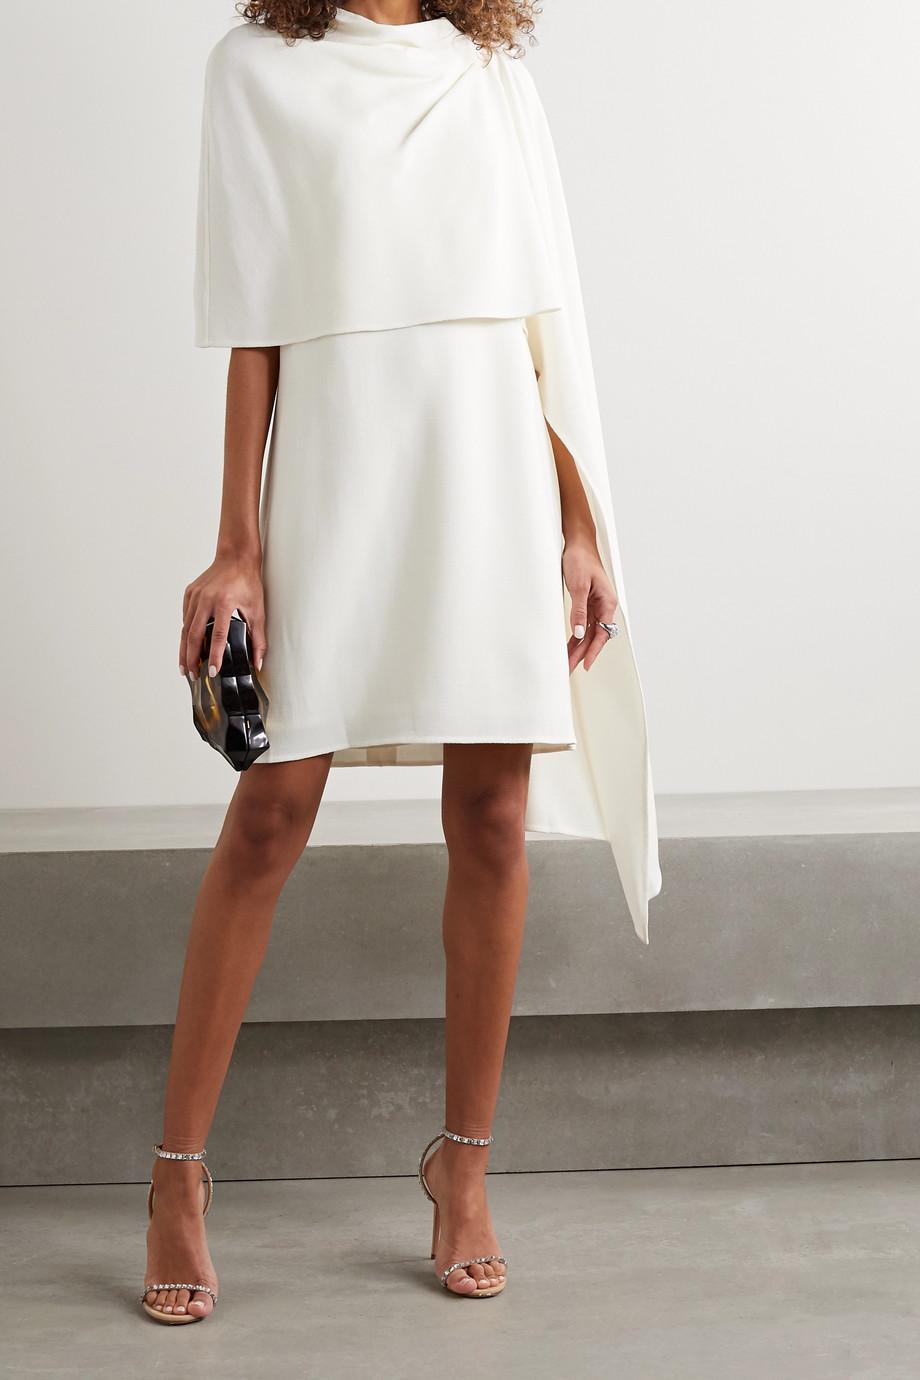 Oscar de la Renta 分层式垂坠羊毛混纺绉纱迷你连衣裙